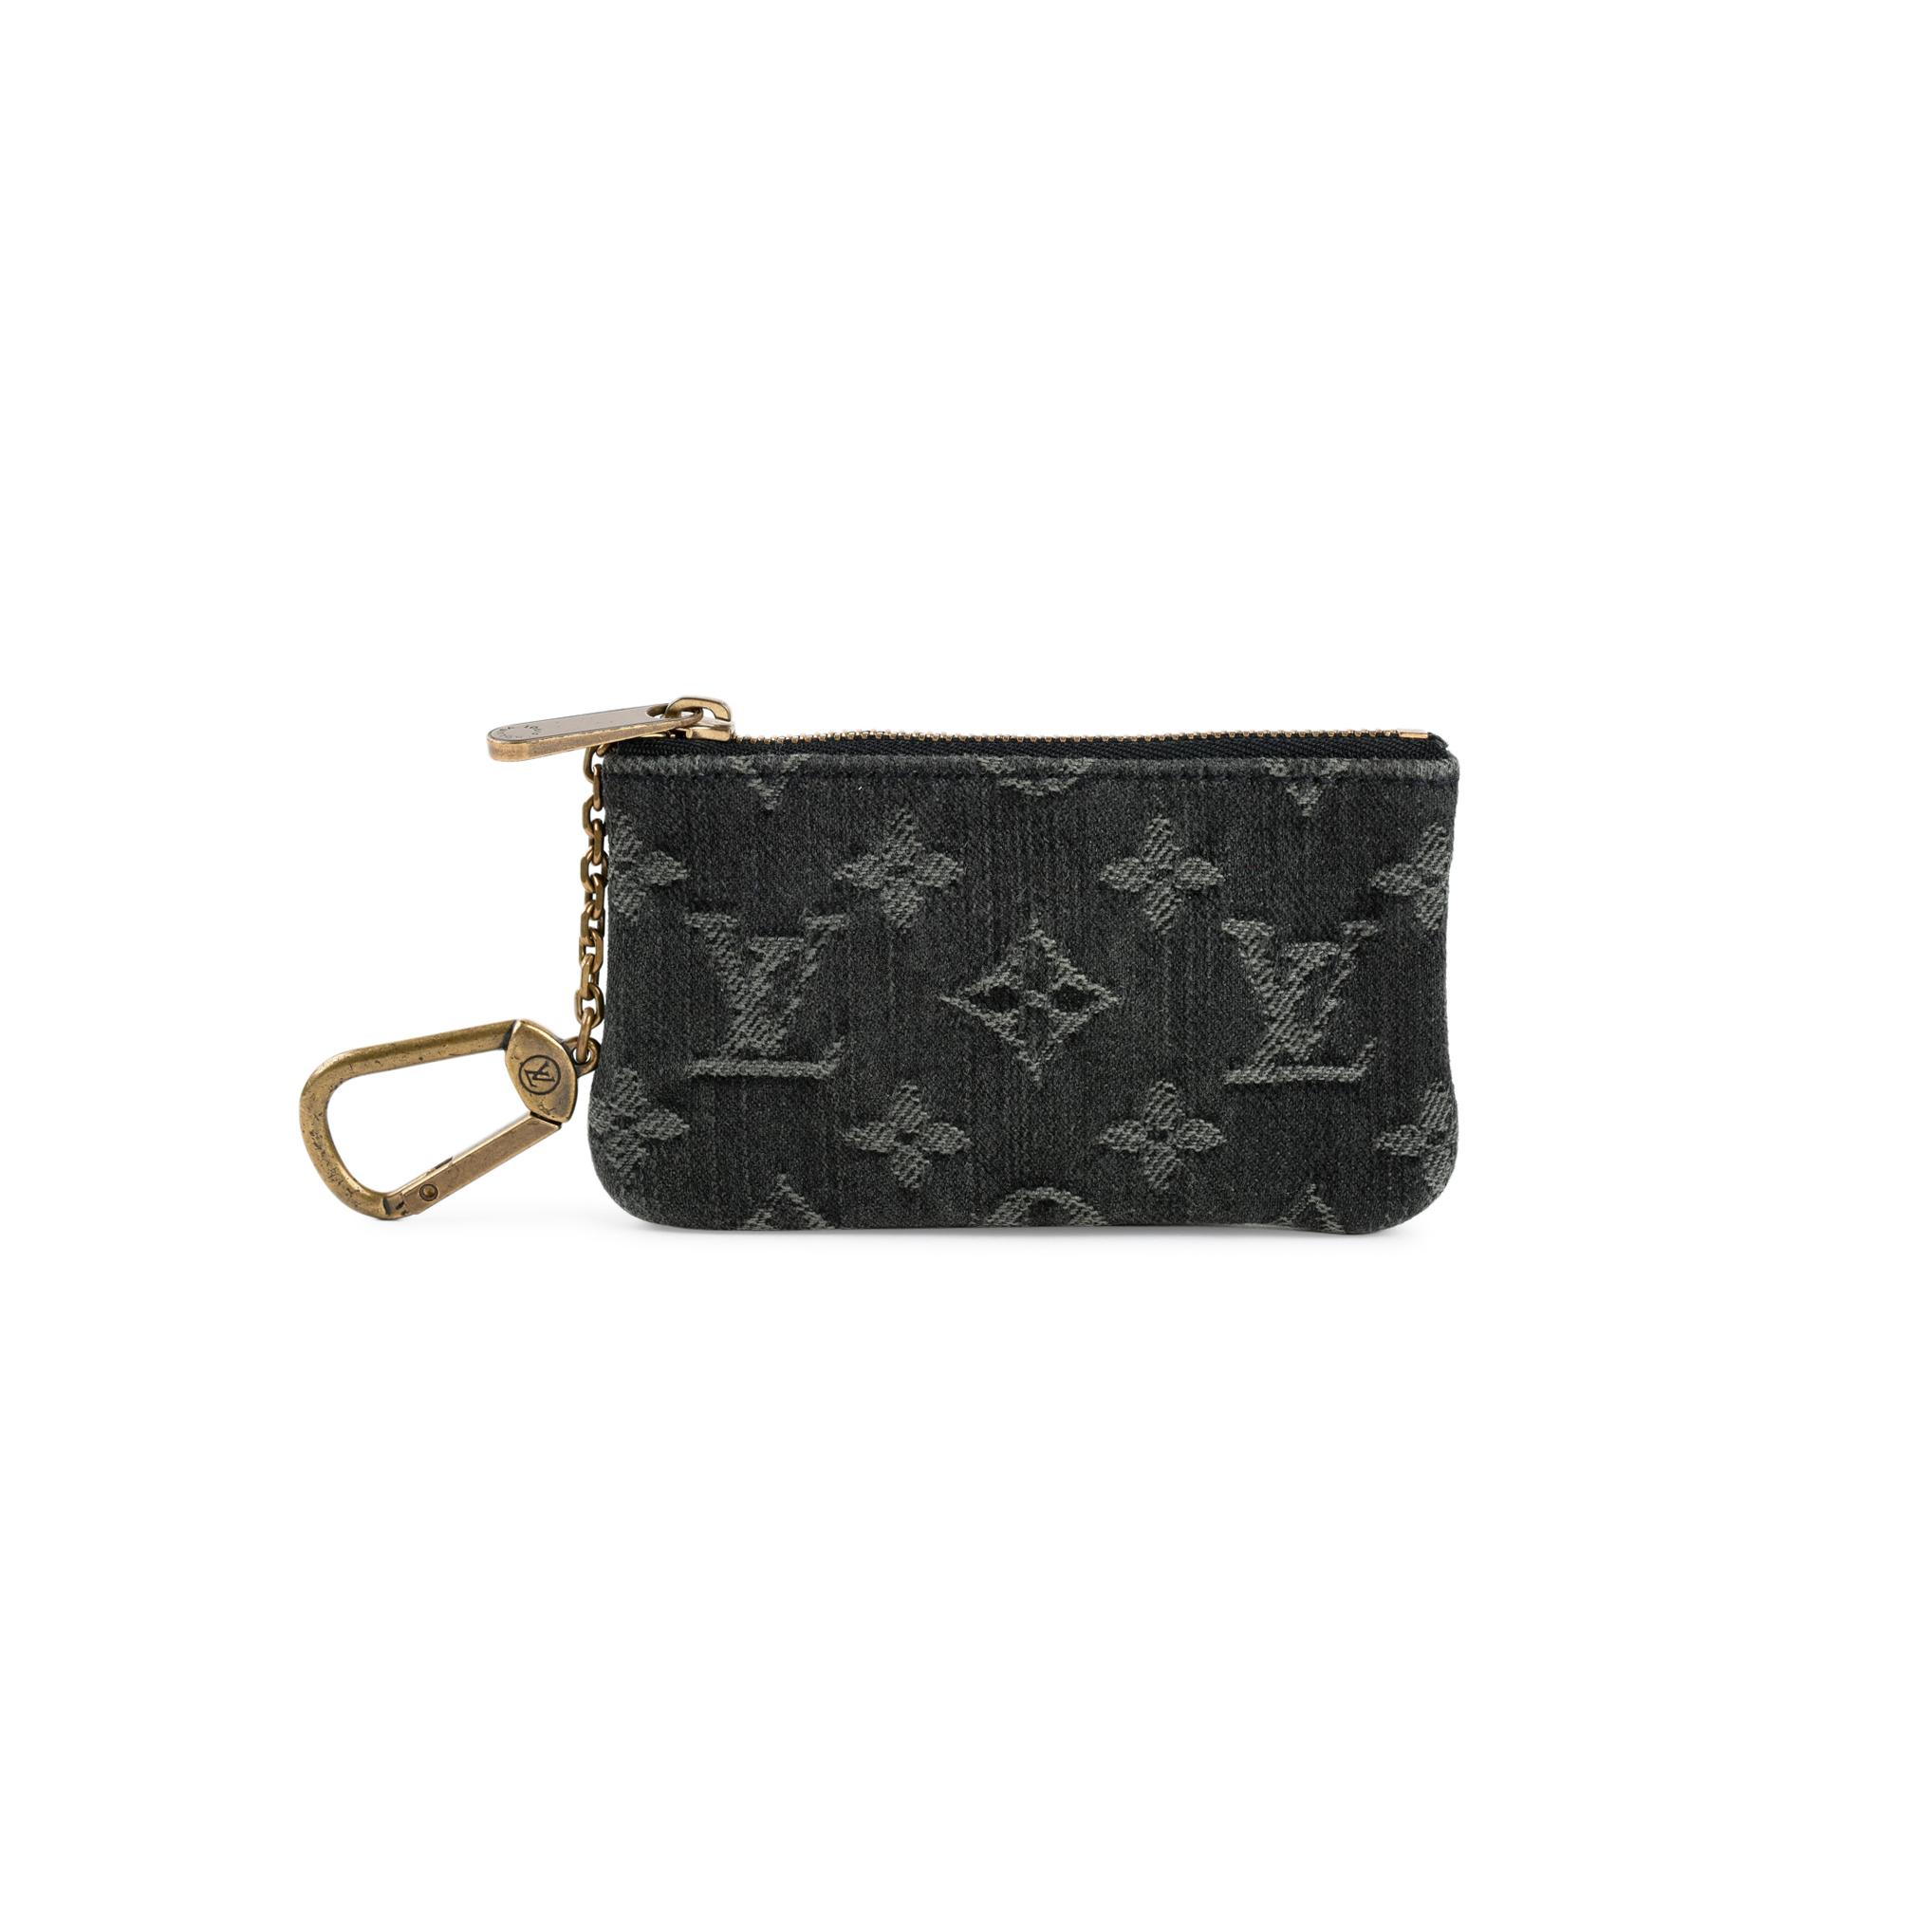 bd8833acdb5f Authentic Second Hand Louis Vuitton Denim Pochette Cles Coin Pouch  (PSS-200-01367)